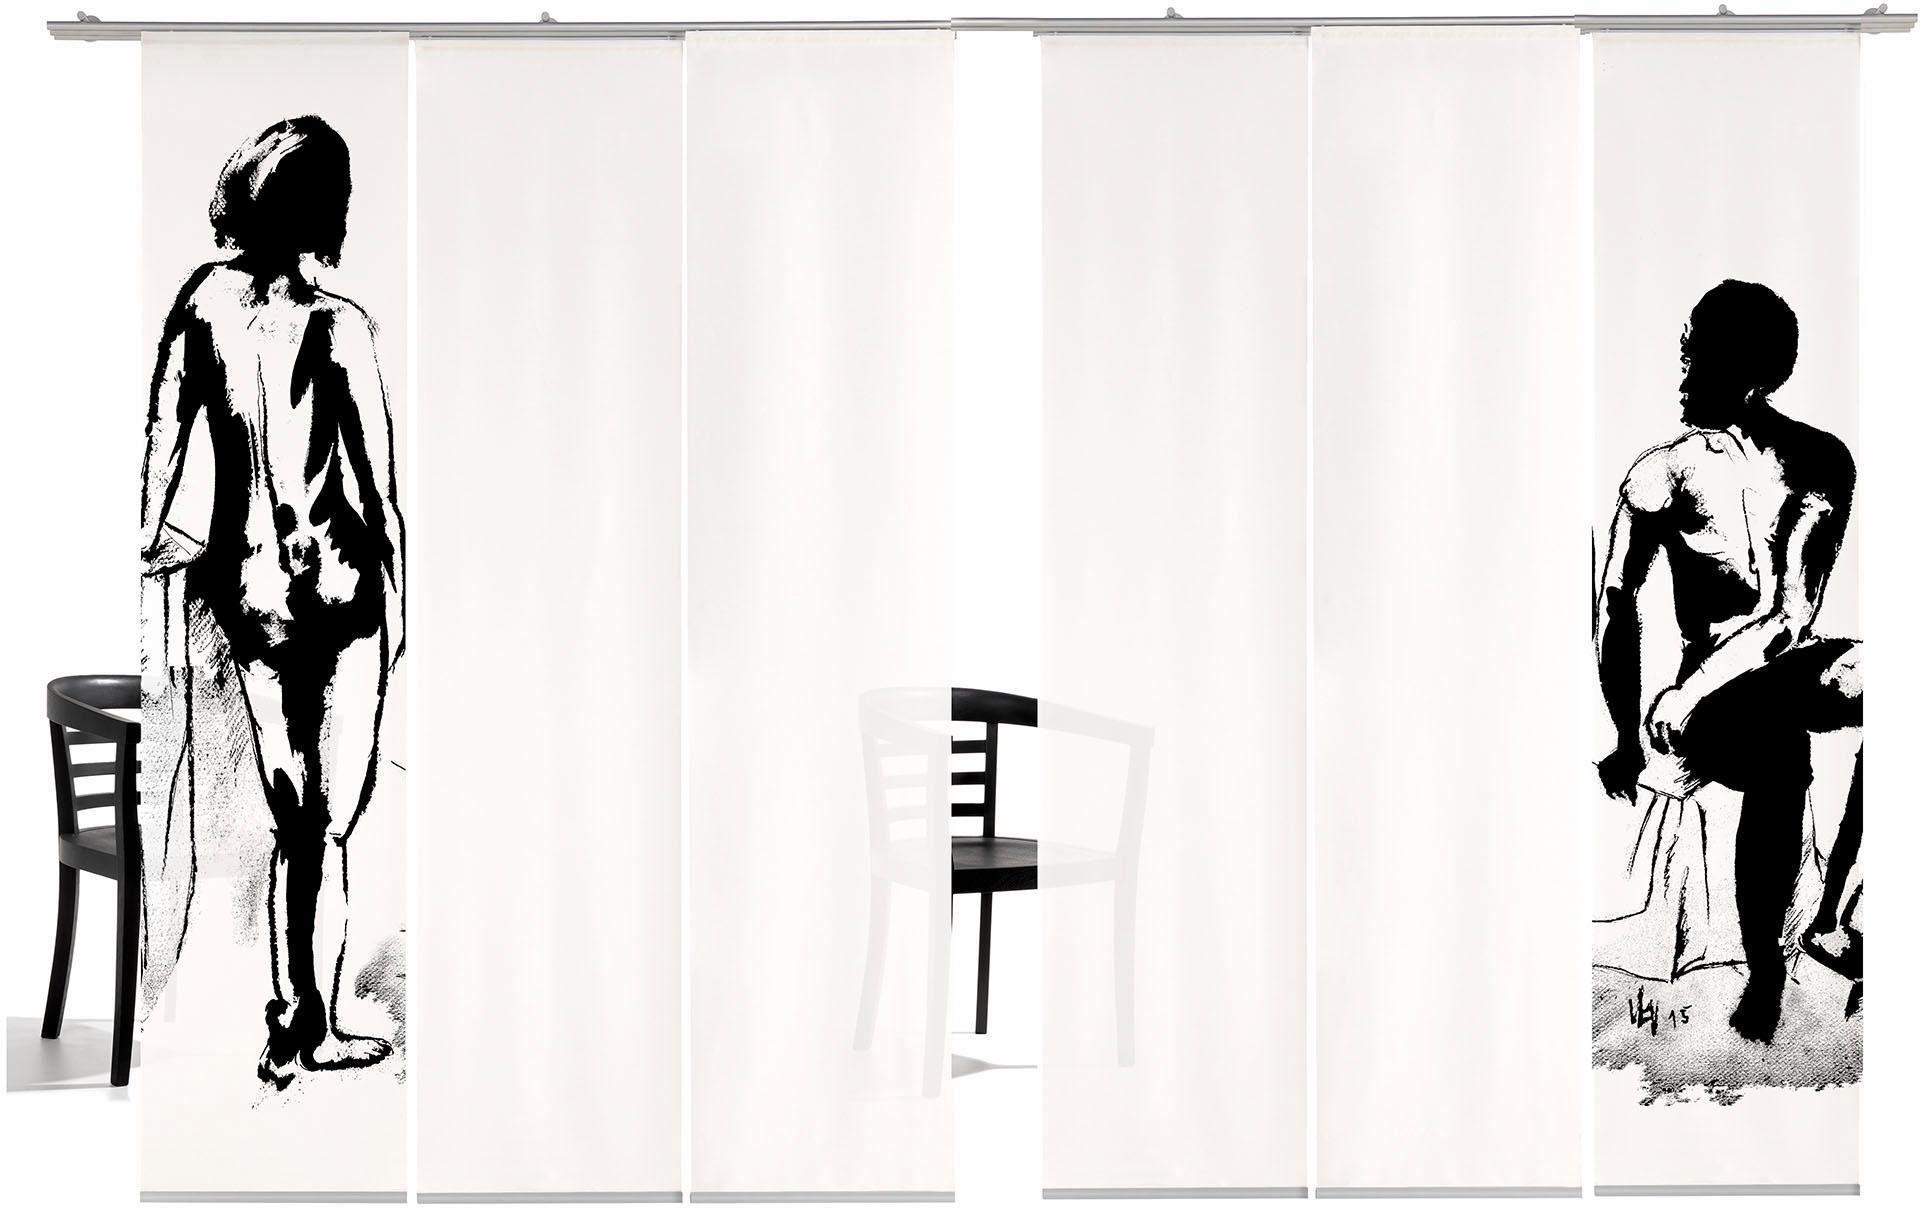 Paneel Gordijn 6 : Paneelgordijn mann frau ha« emotion textiles klittenband set